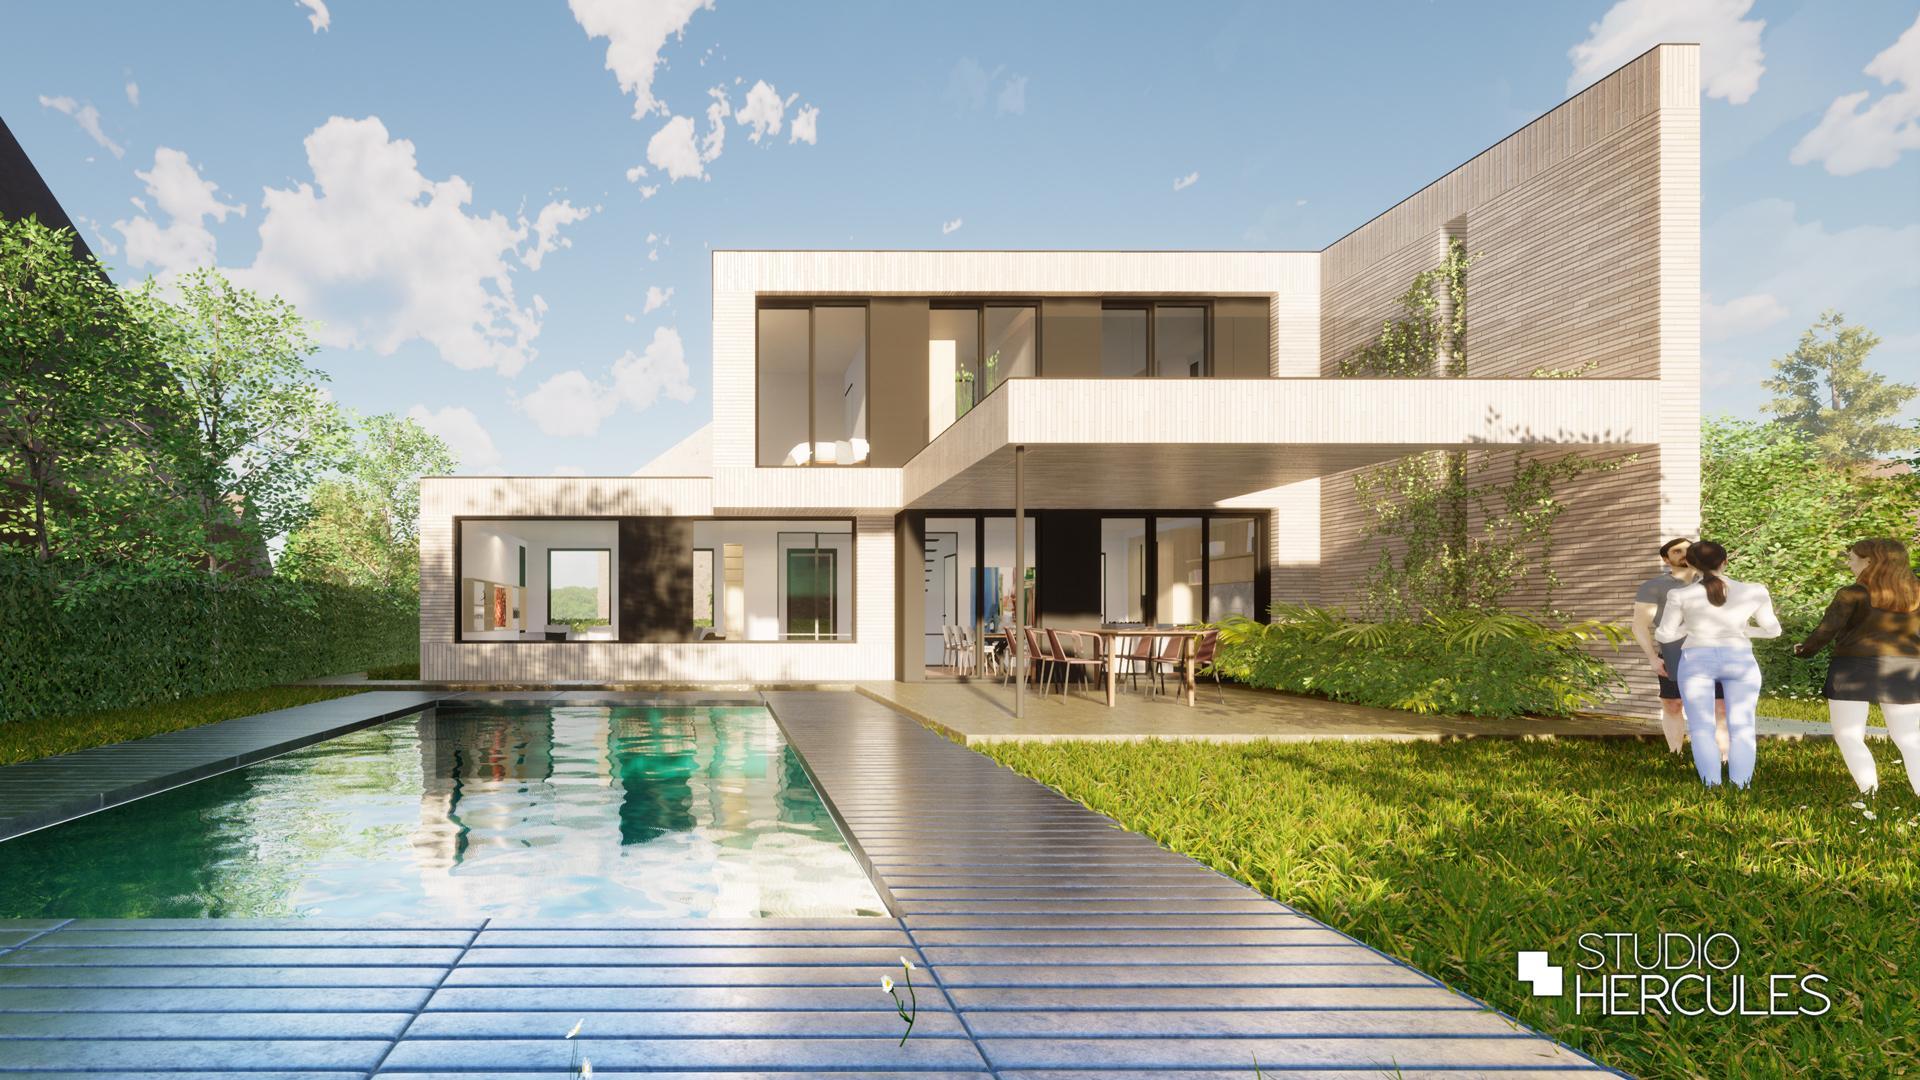 Gevelontwerp-architect-amsterdam